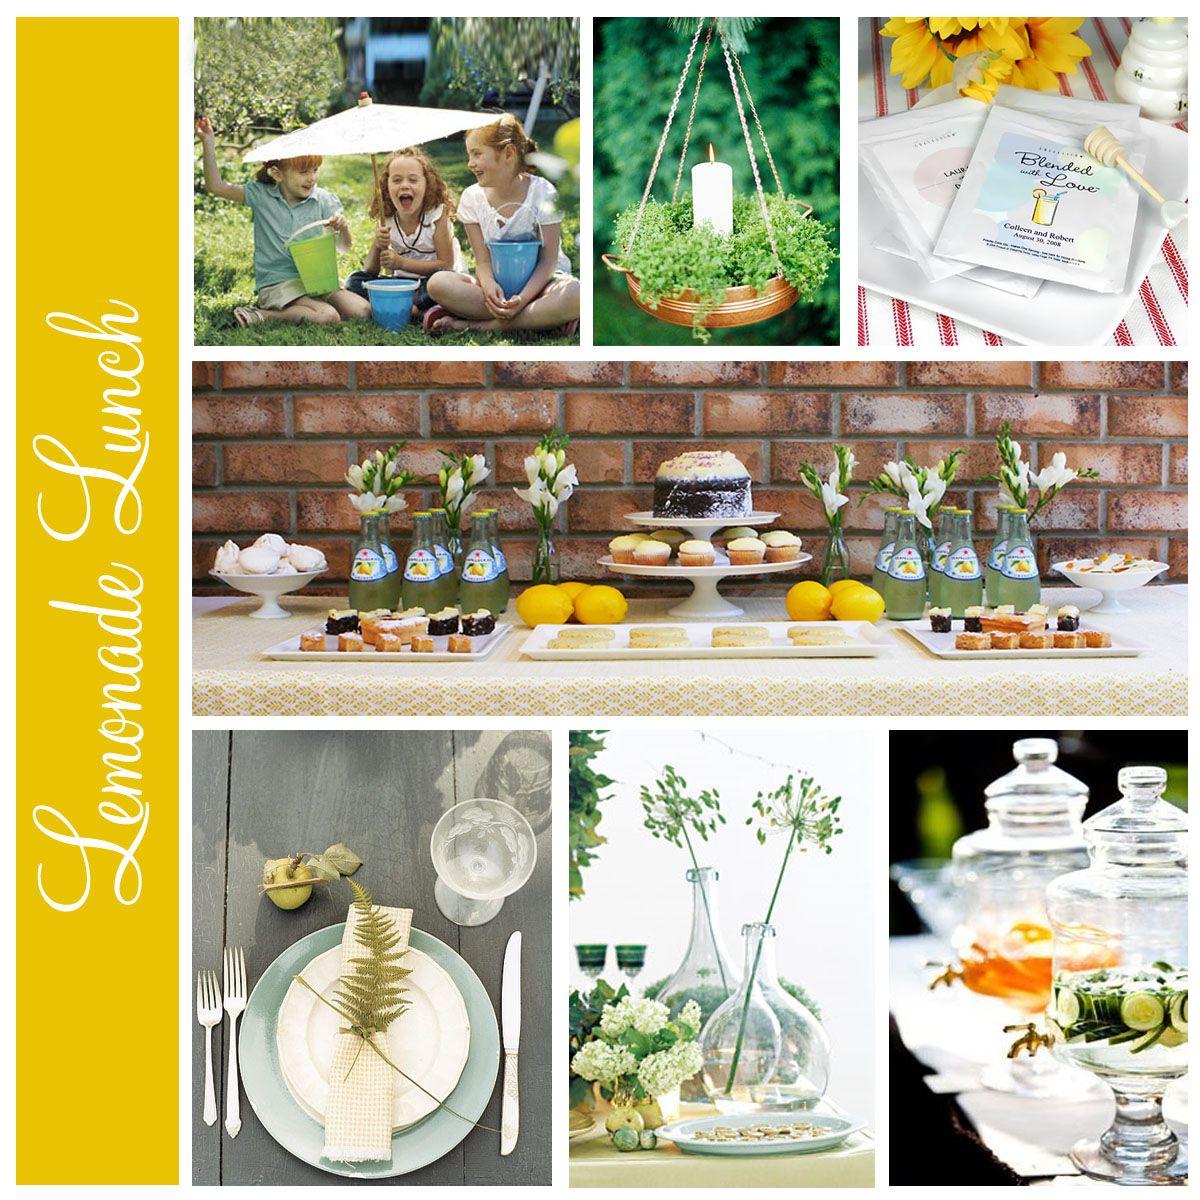 lemonade spring lunch party ideas spring pinterest